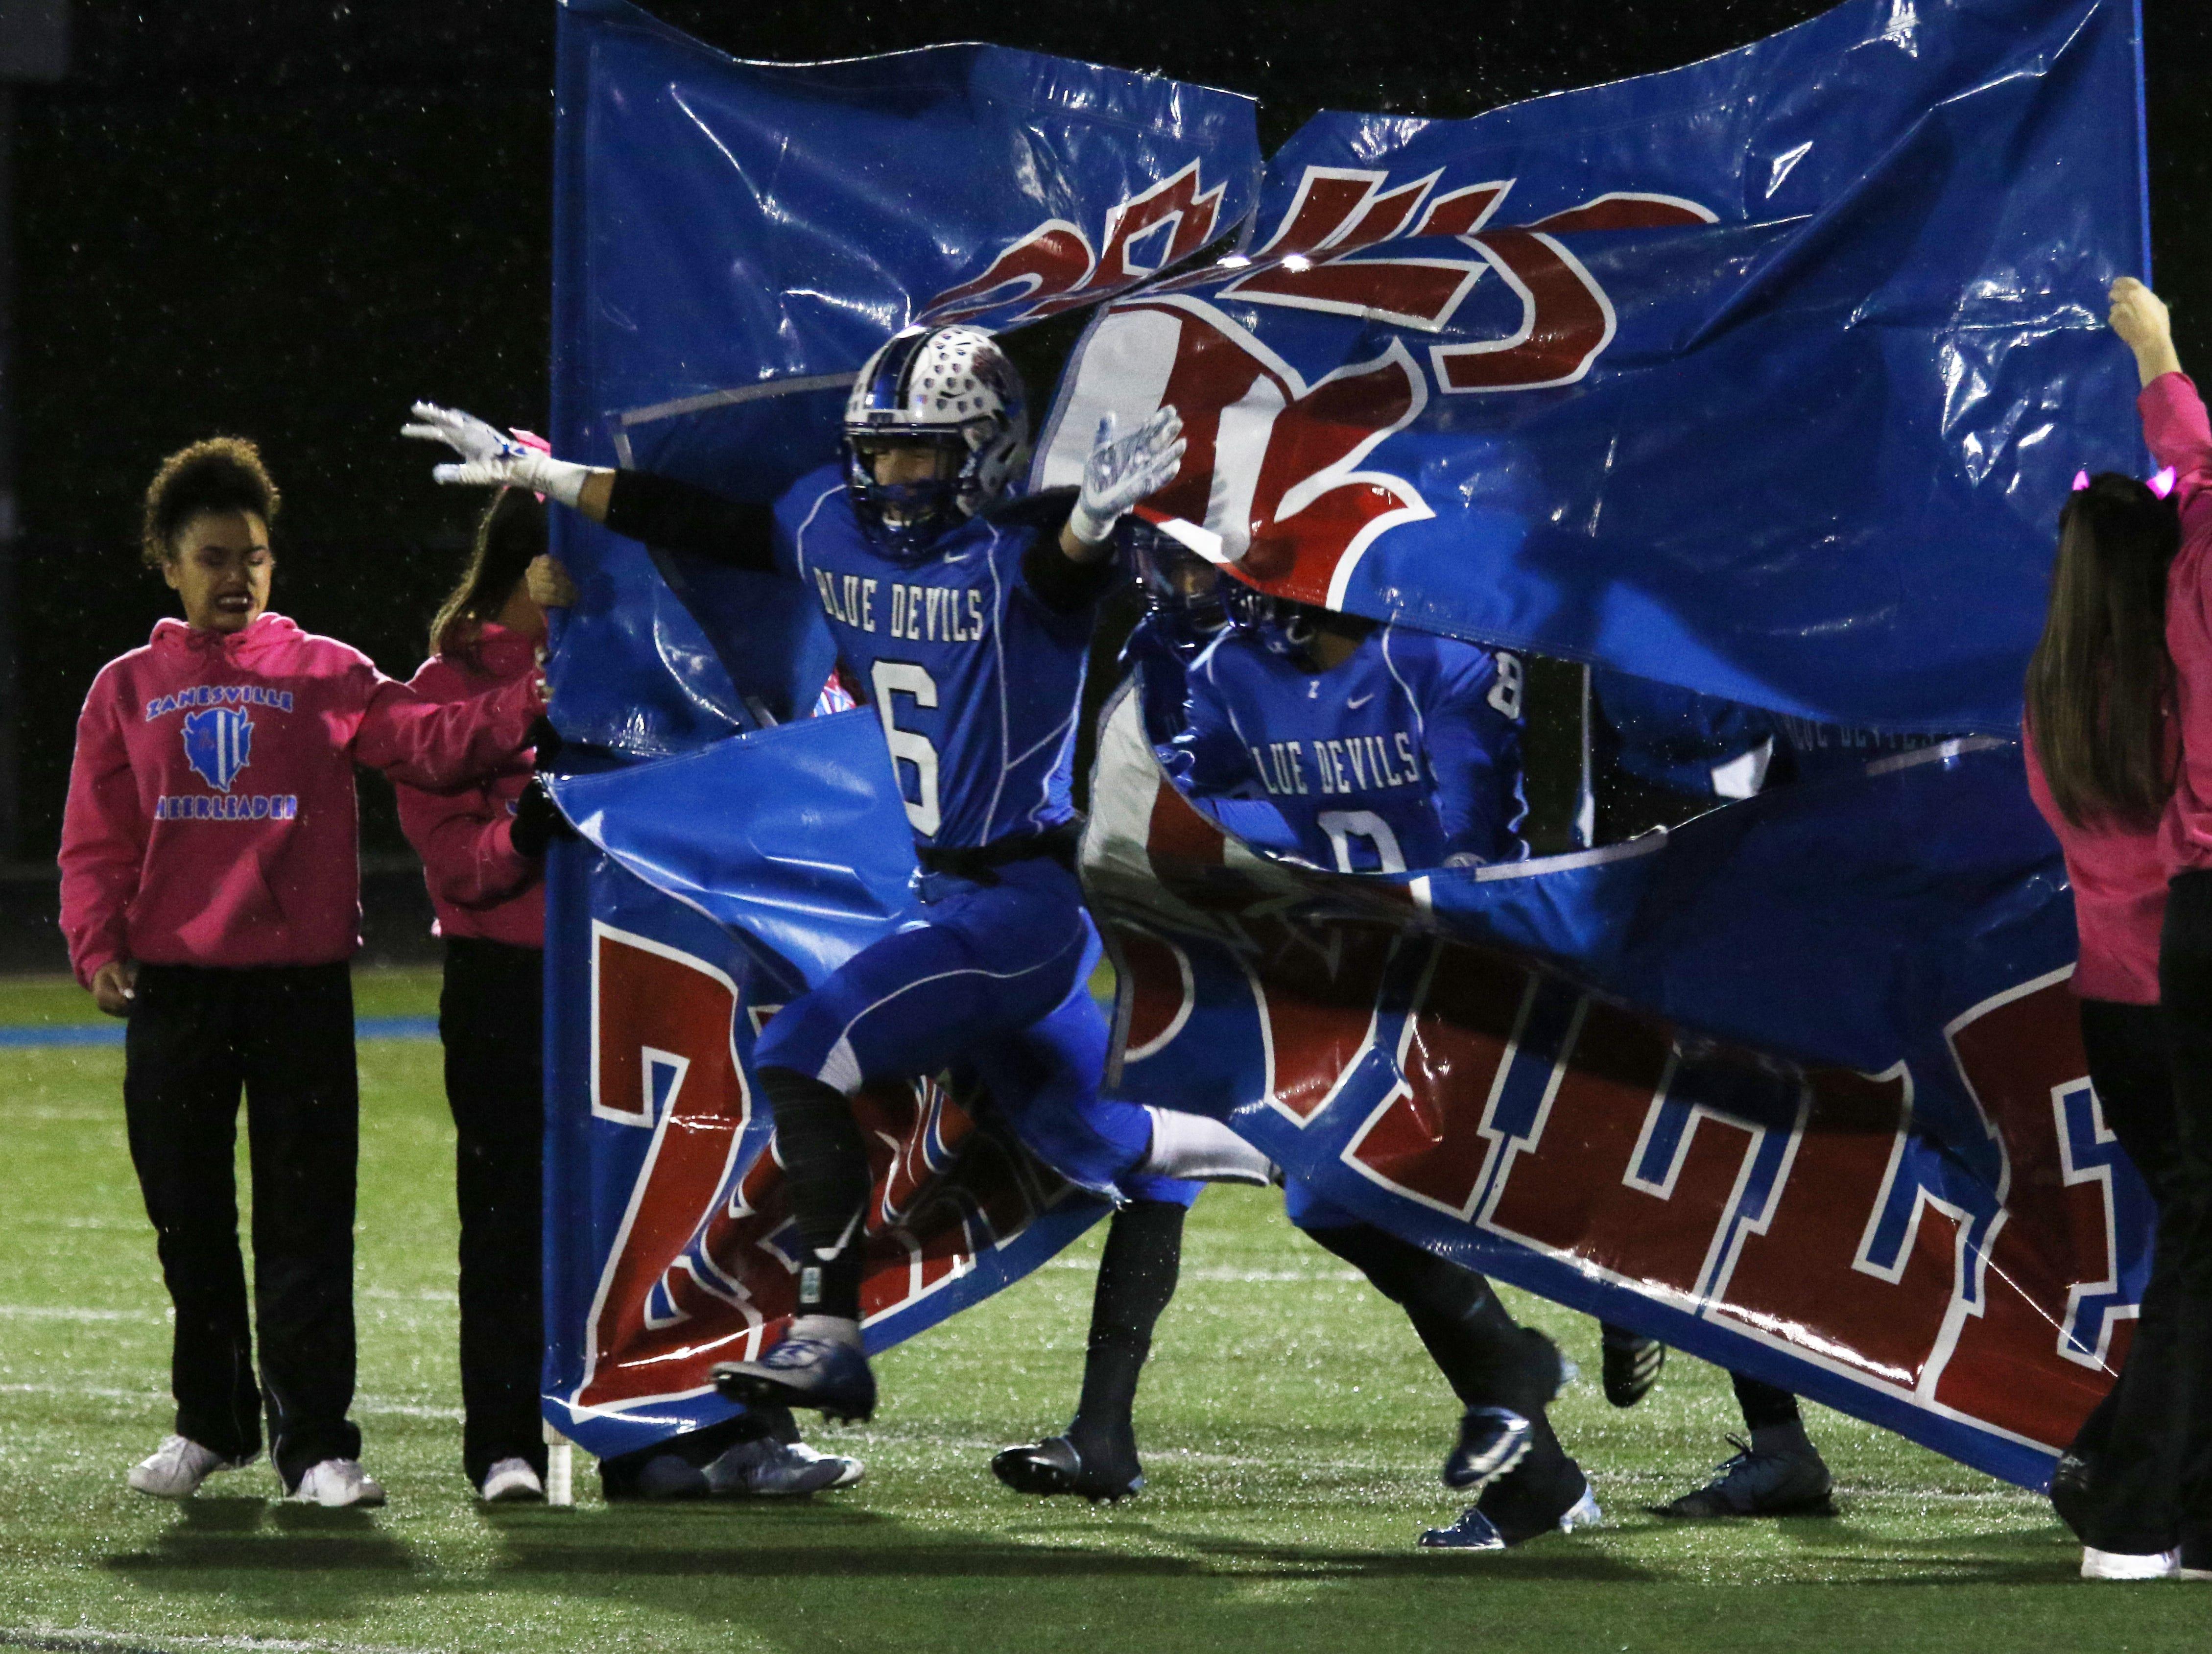 Zanesville takes the field against New Philadelphia.